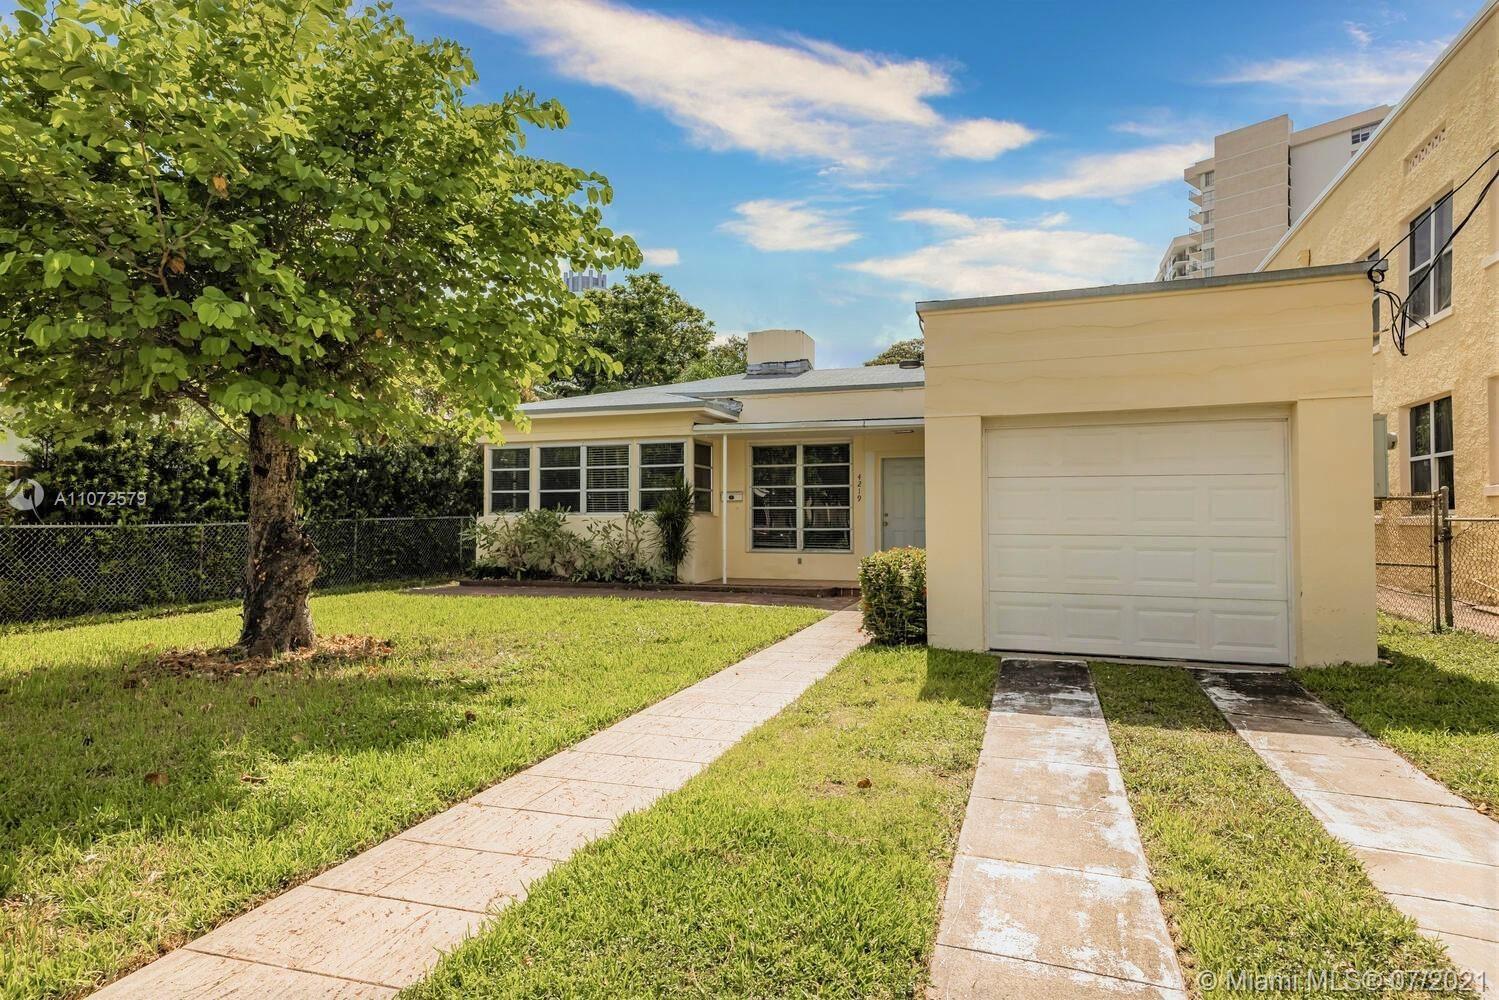 4219 Sheridan Ave, Miami Beach, FL 33140 - #: A11072579